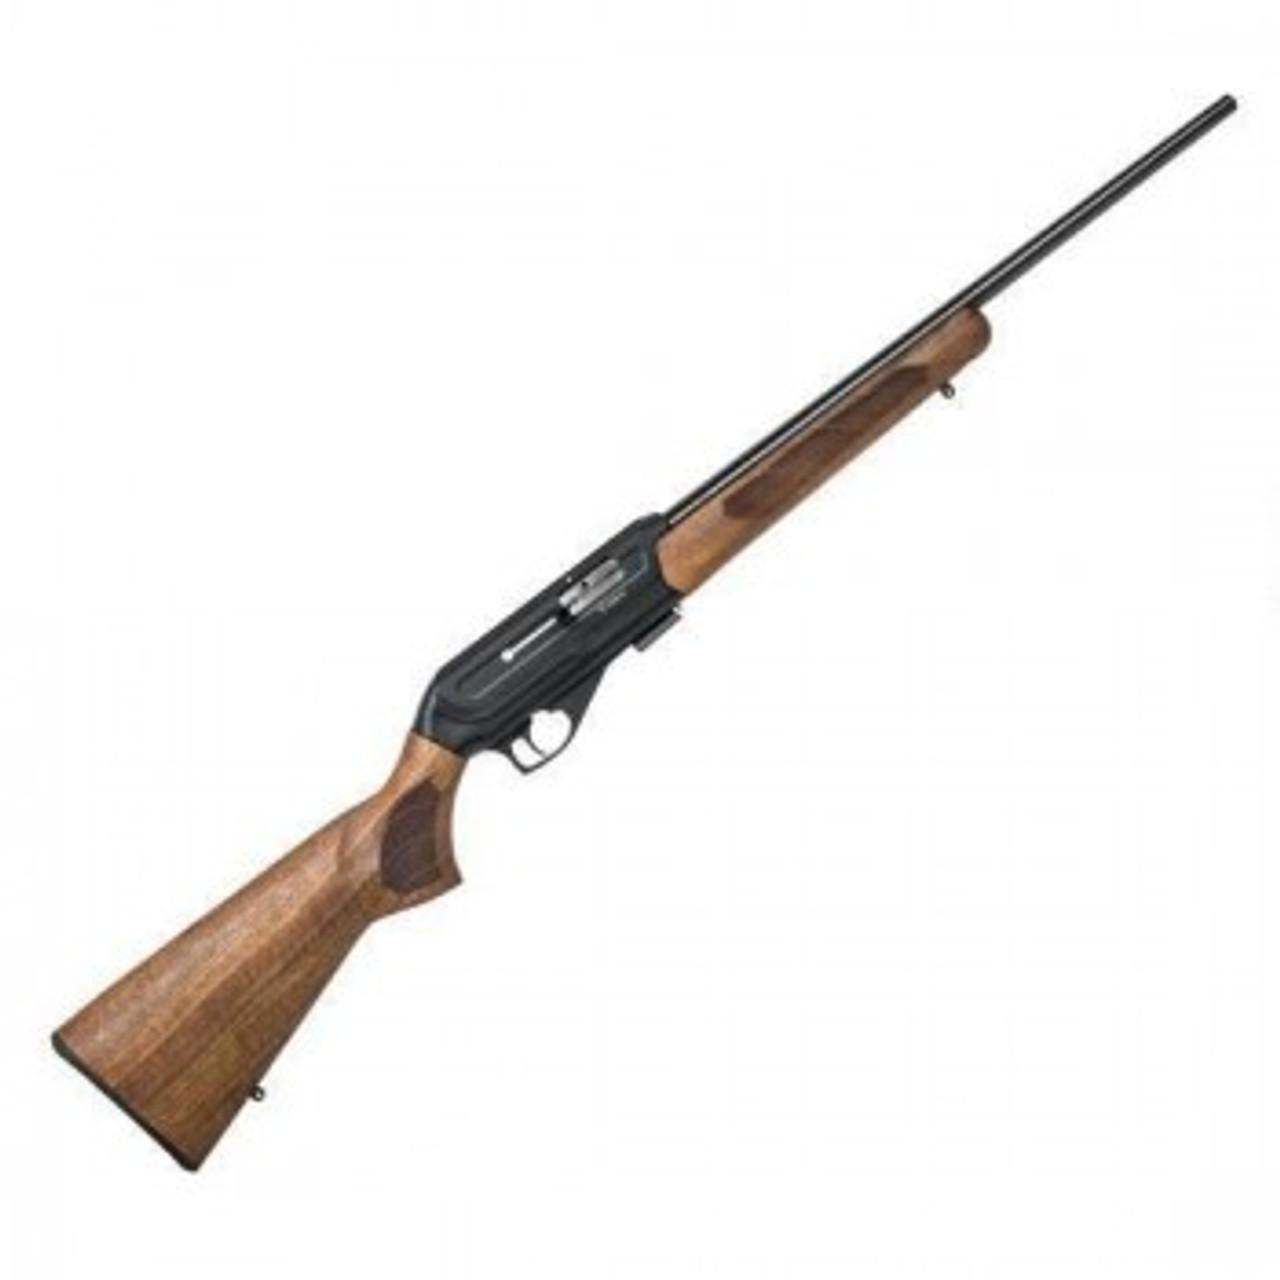 "CZ 512 Semi-Auto Rifle .22LR, 20.5"" Barrel, 5 Rounds, Wood Stock, Blued"